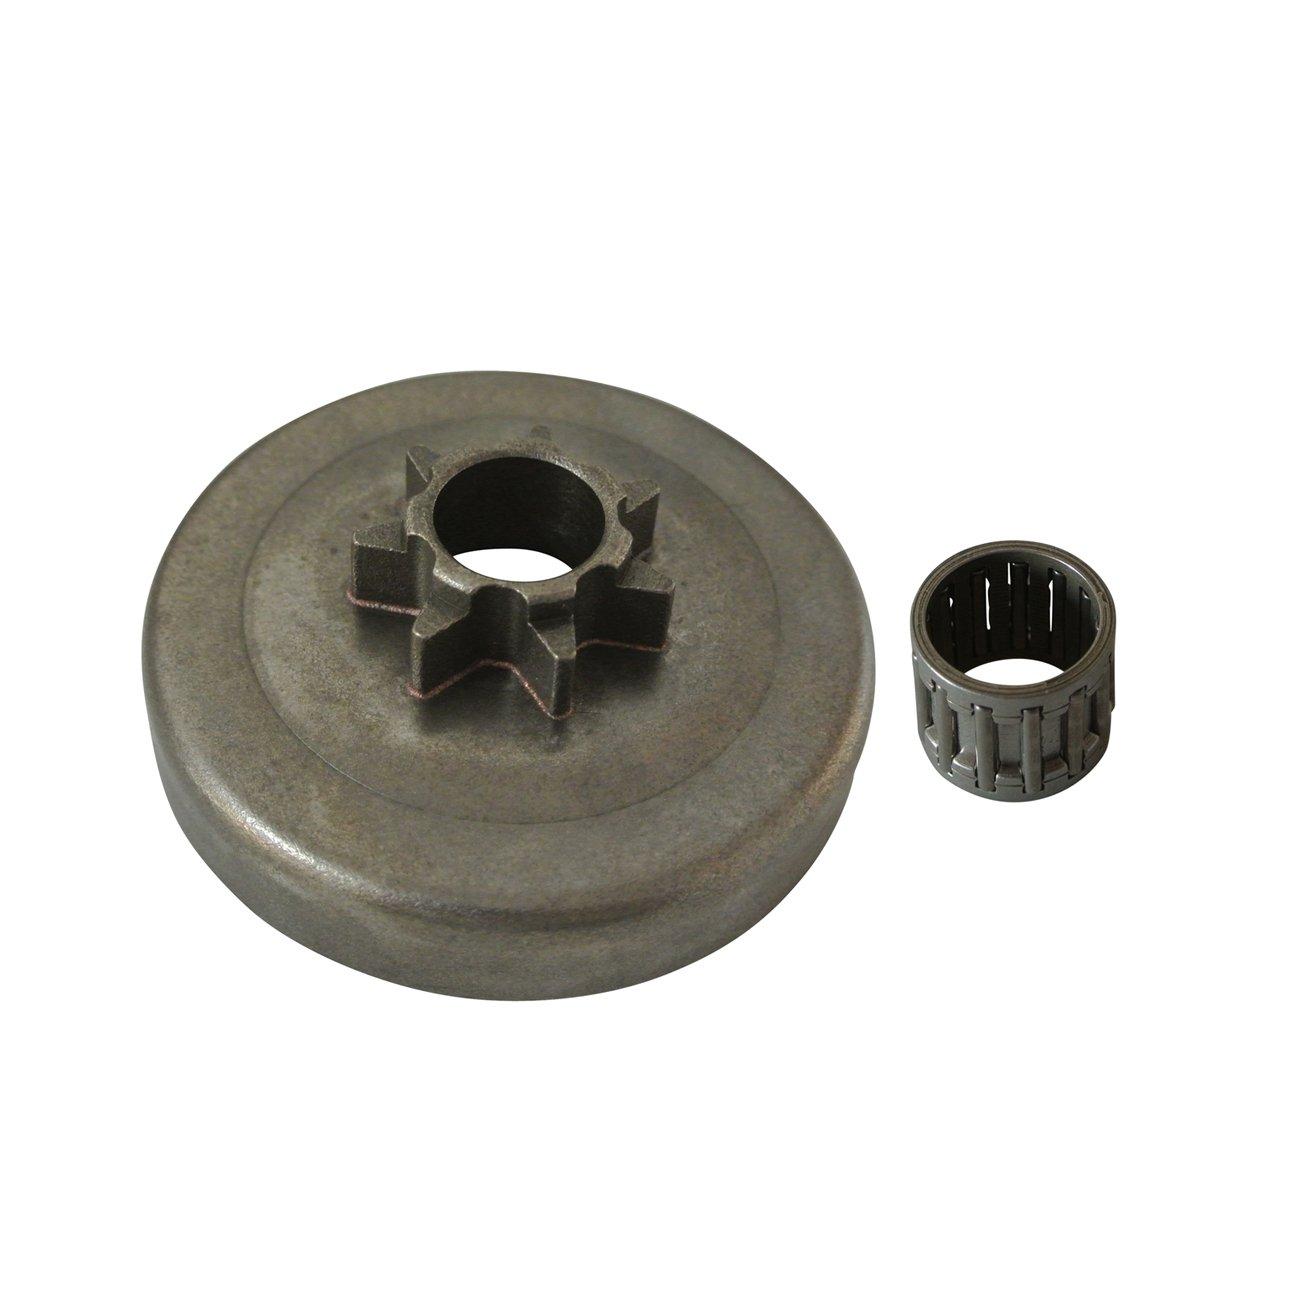 JRL Sprocket Clutch Drum Needle Bearing Fit Husqvarna 351 353 357 359 445 Chainsaw Kang Tai